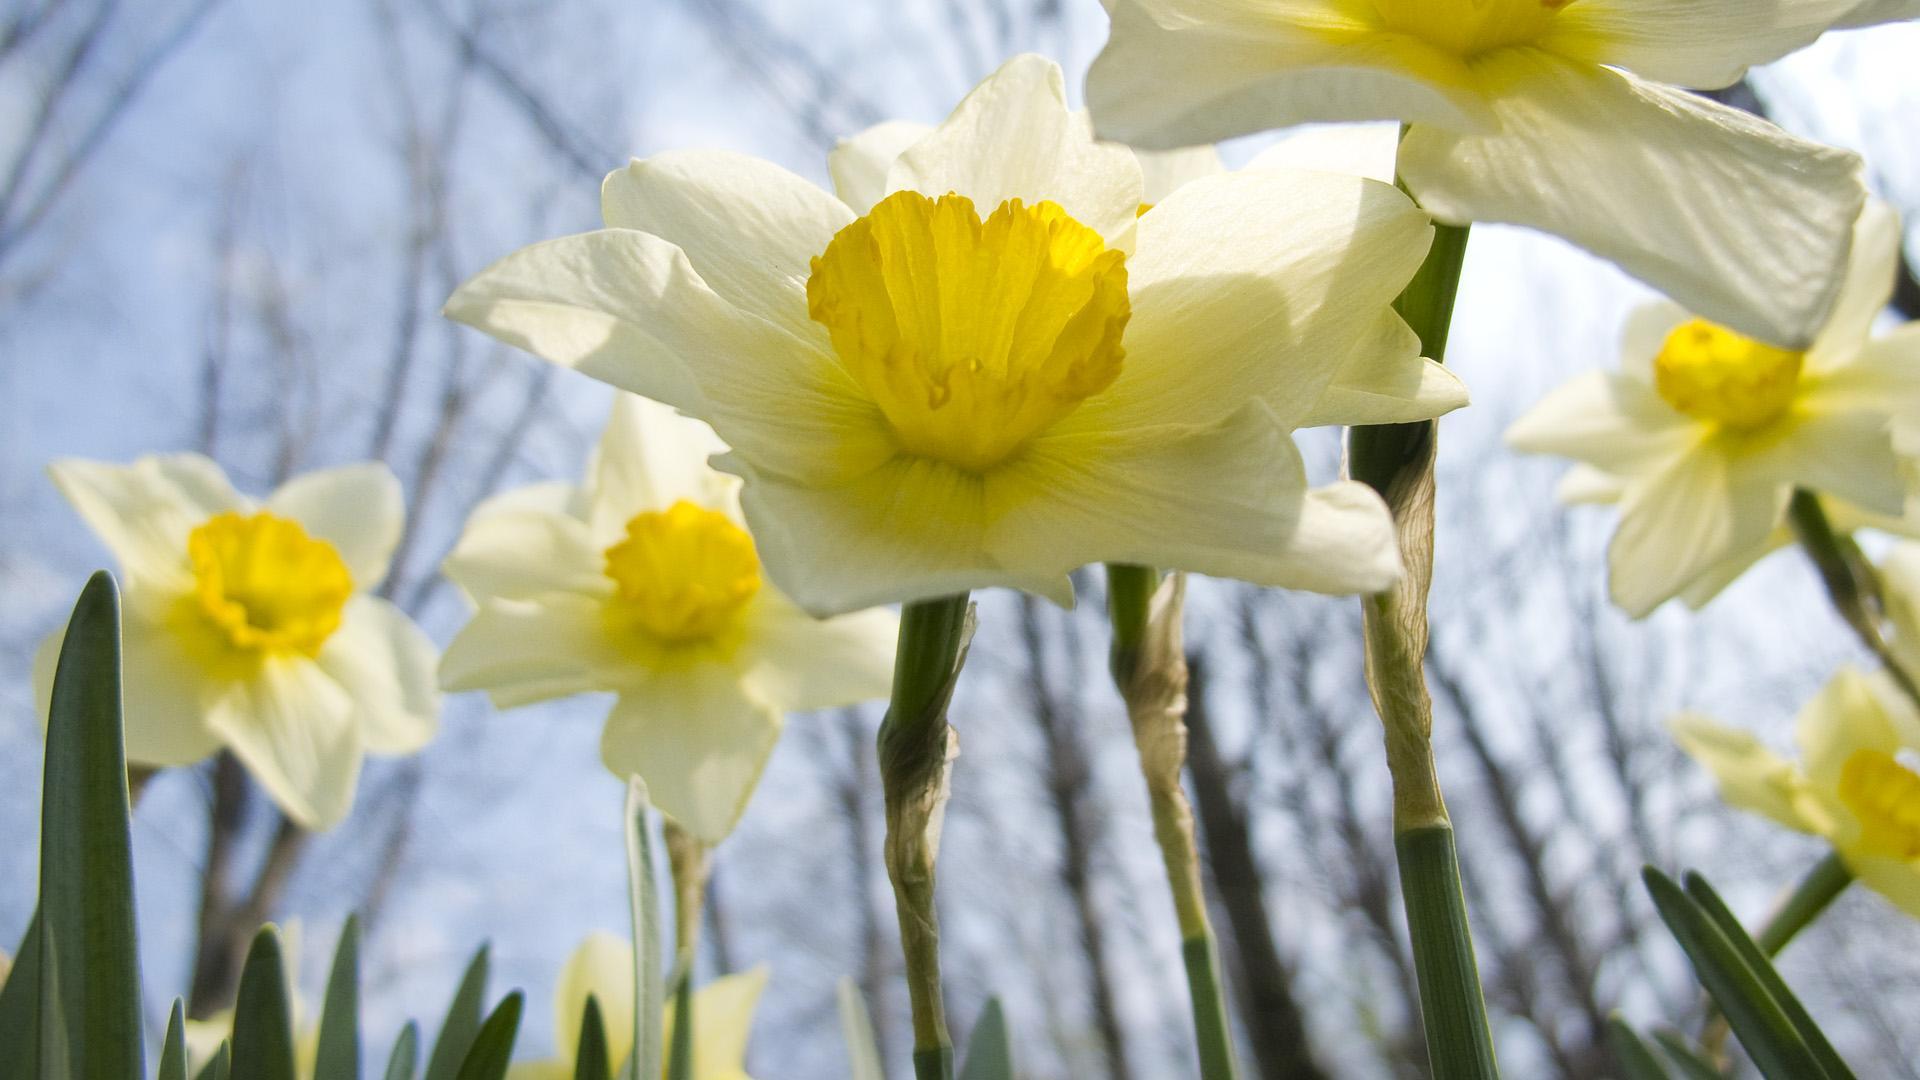 Daffodil wallpapers HD quality